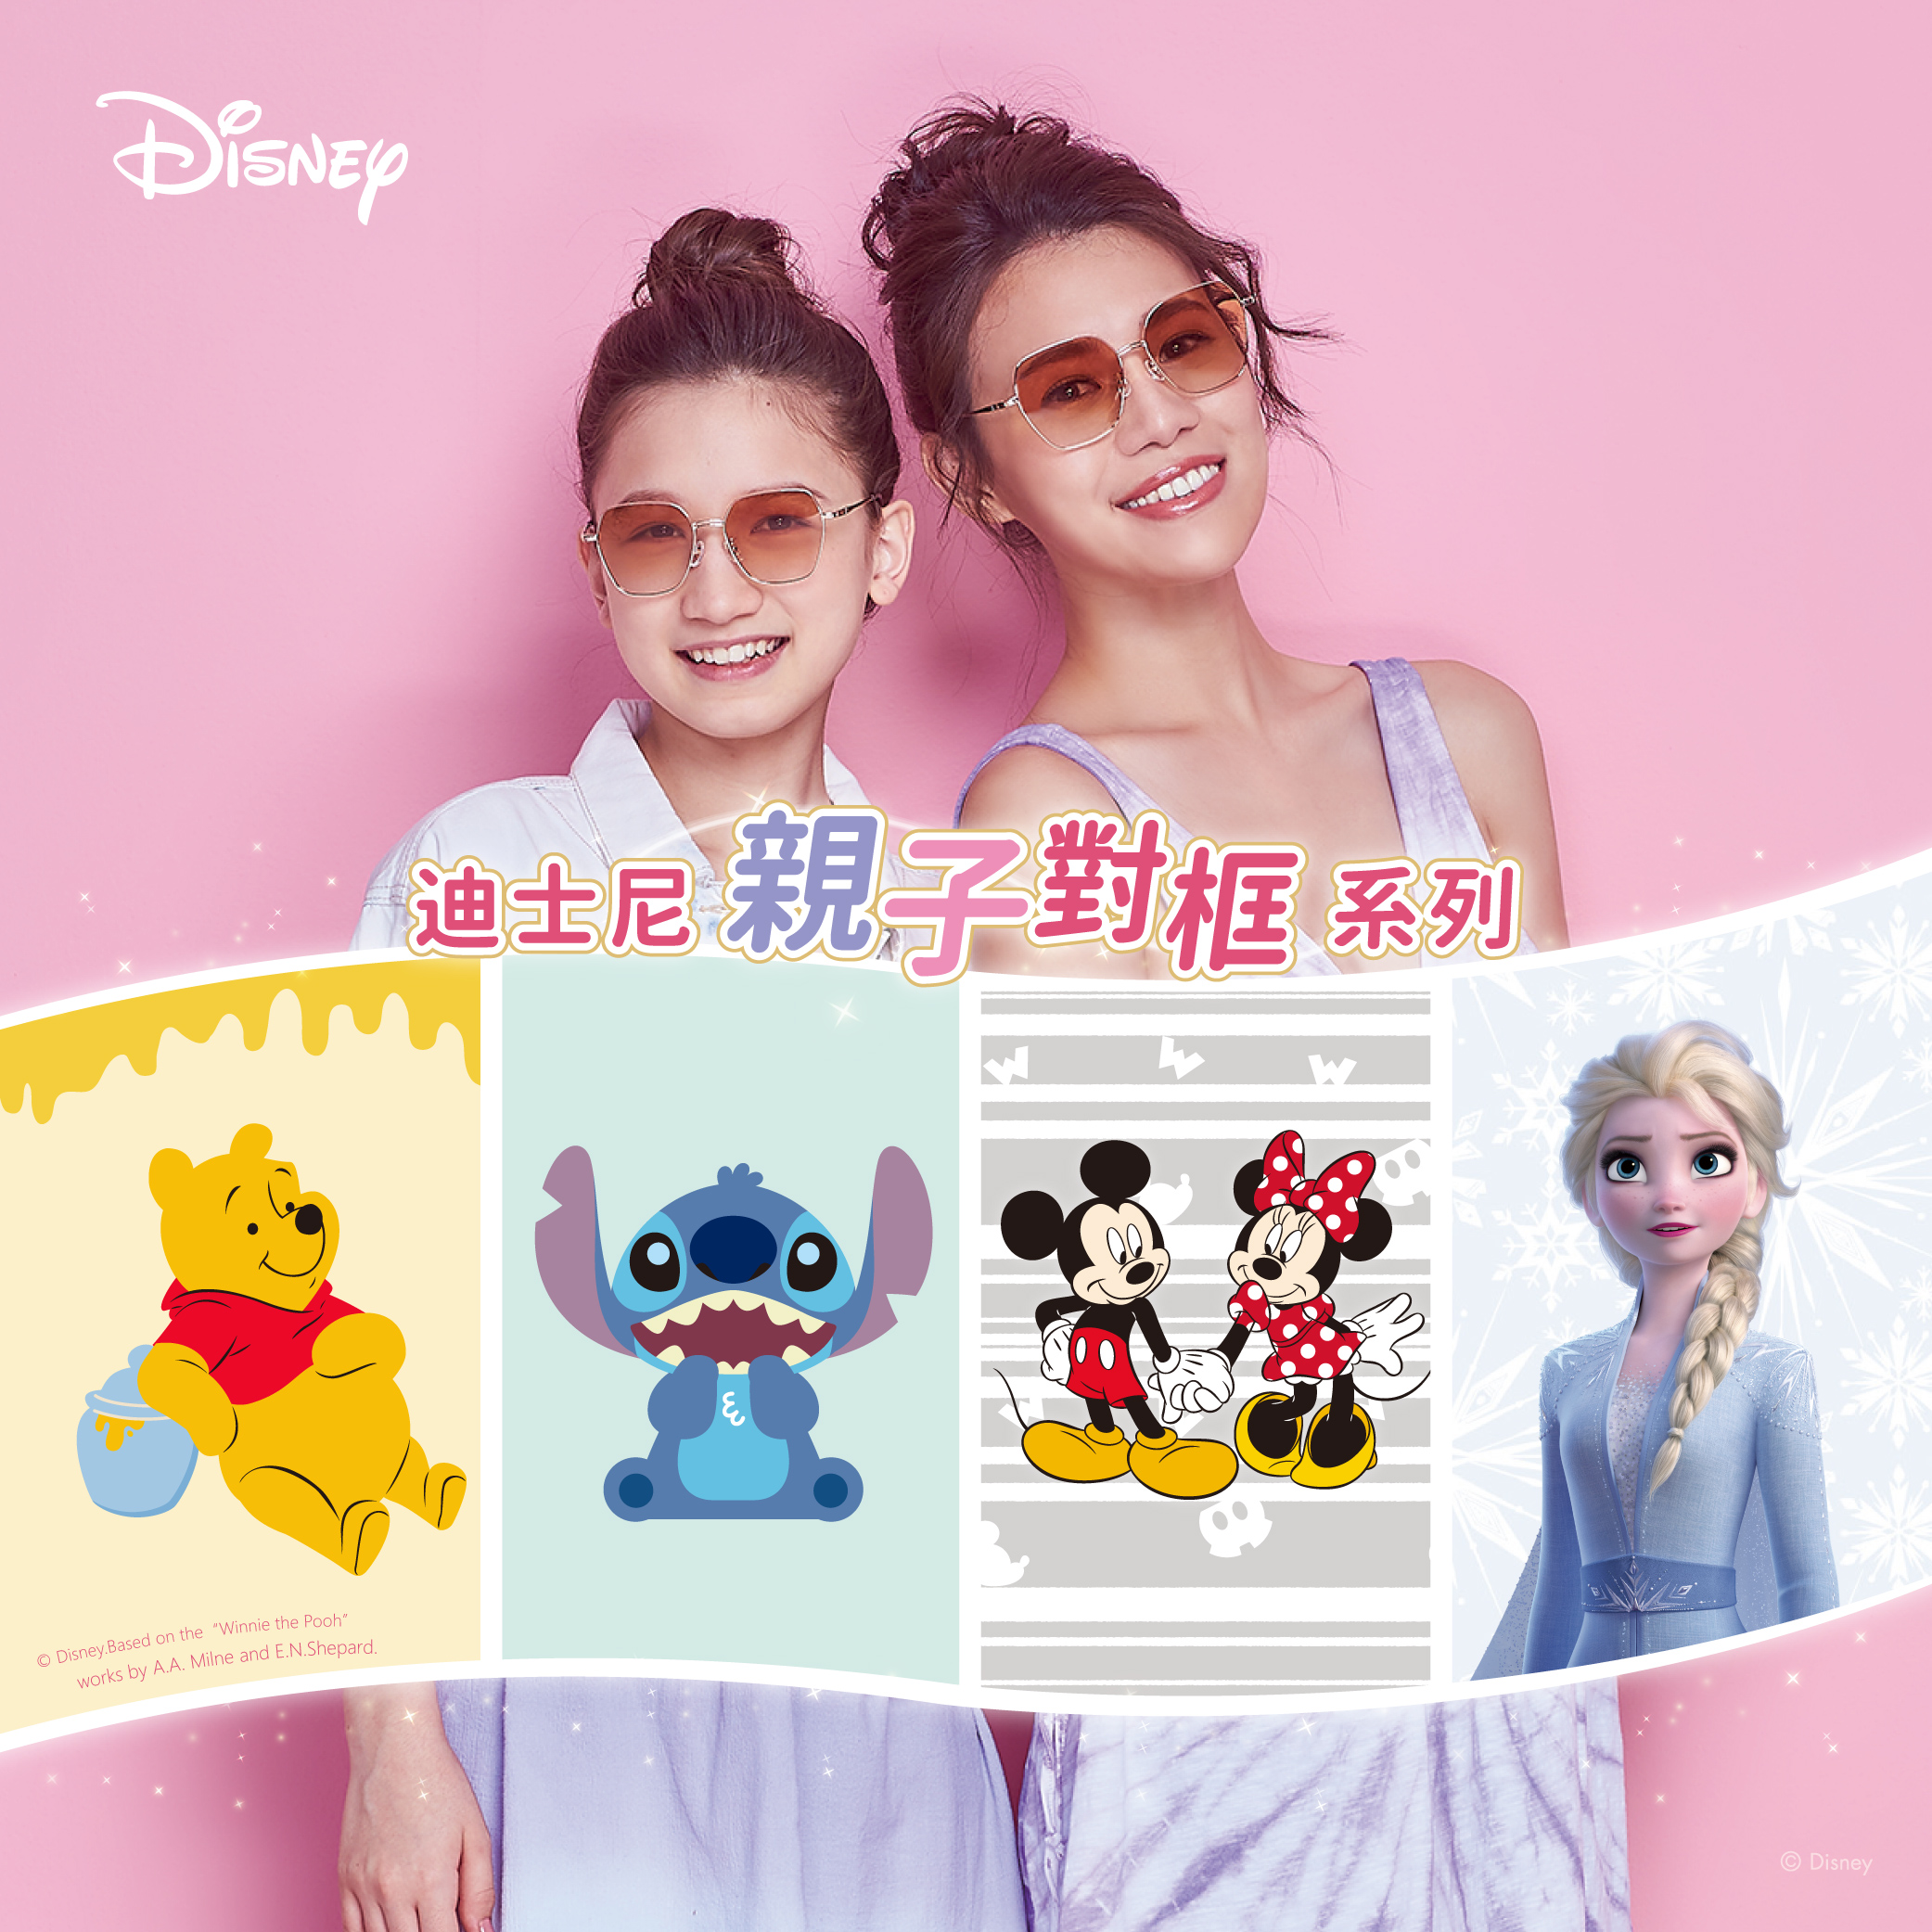 Disney 米奇│藝術國度 圓框眼鏡 狂潮黑